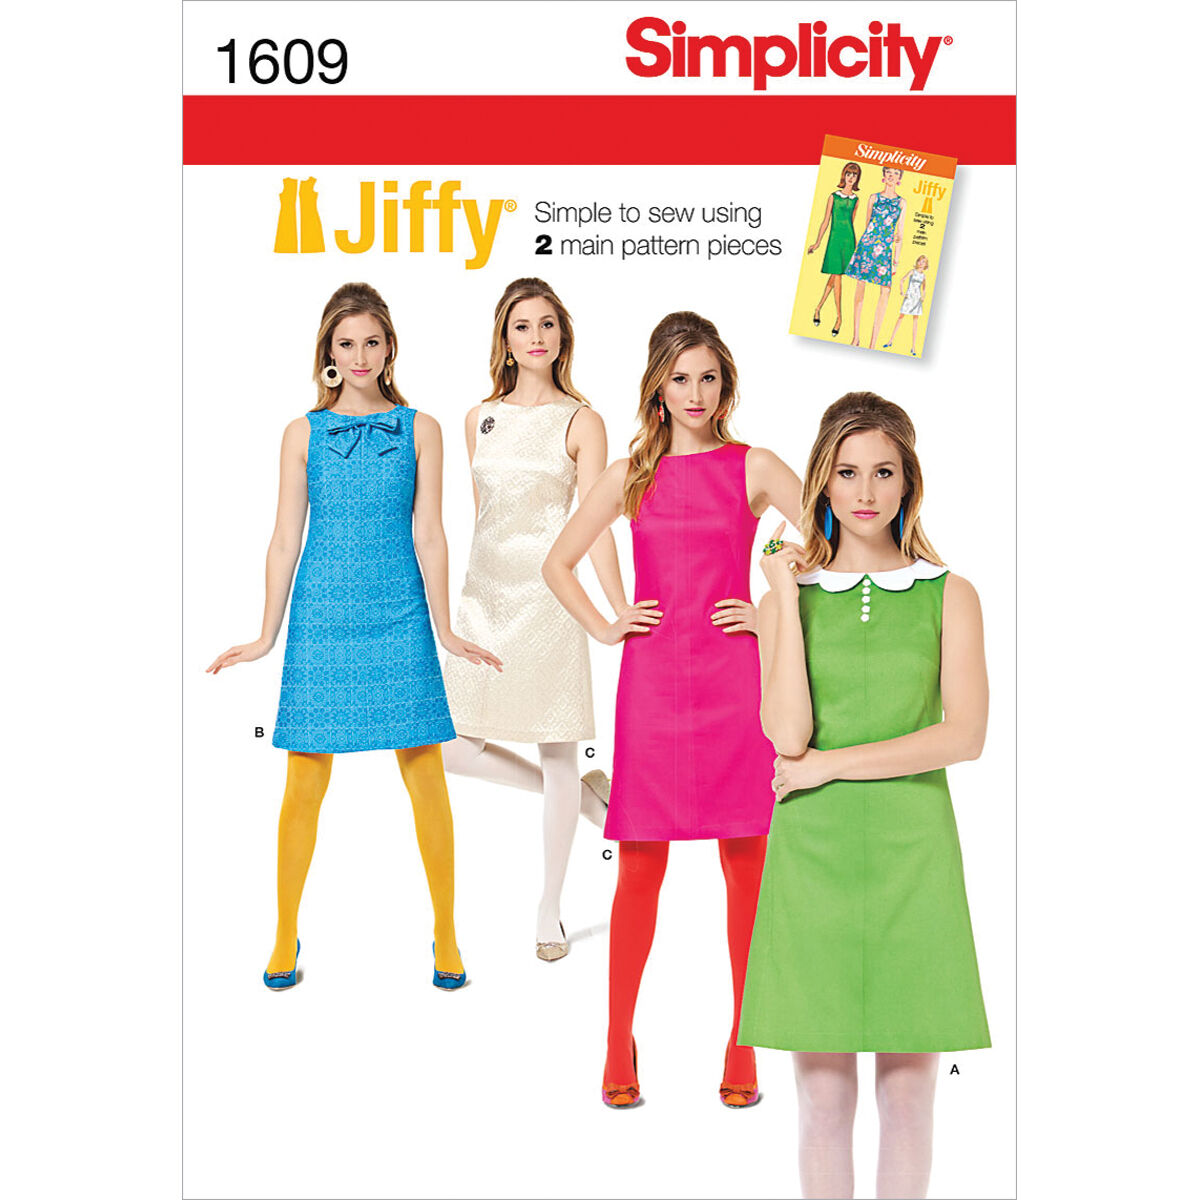 1960s – 70s Sewing Patterns- Dresses, Tops, Pants, Mens Simplicity Pattern 1609H5 6 - 8 - 10 - 12 - - Simplicity Misses Dr $17.95 AT vintagedancer.com